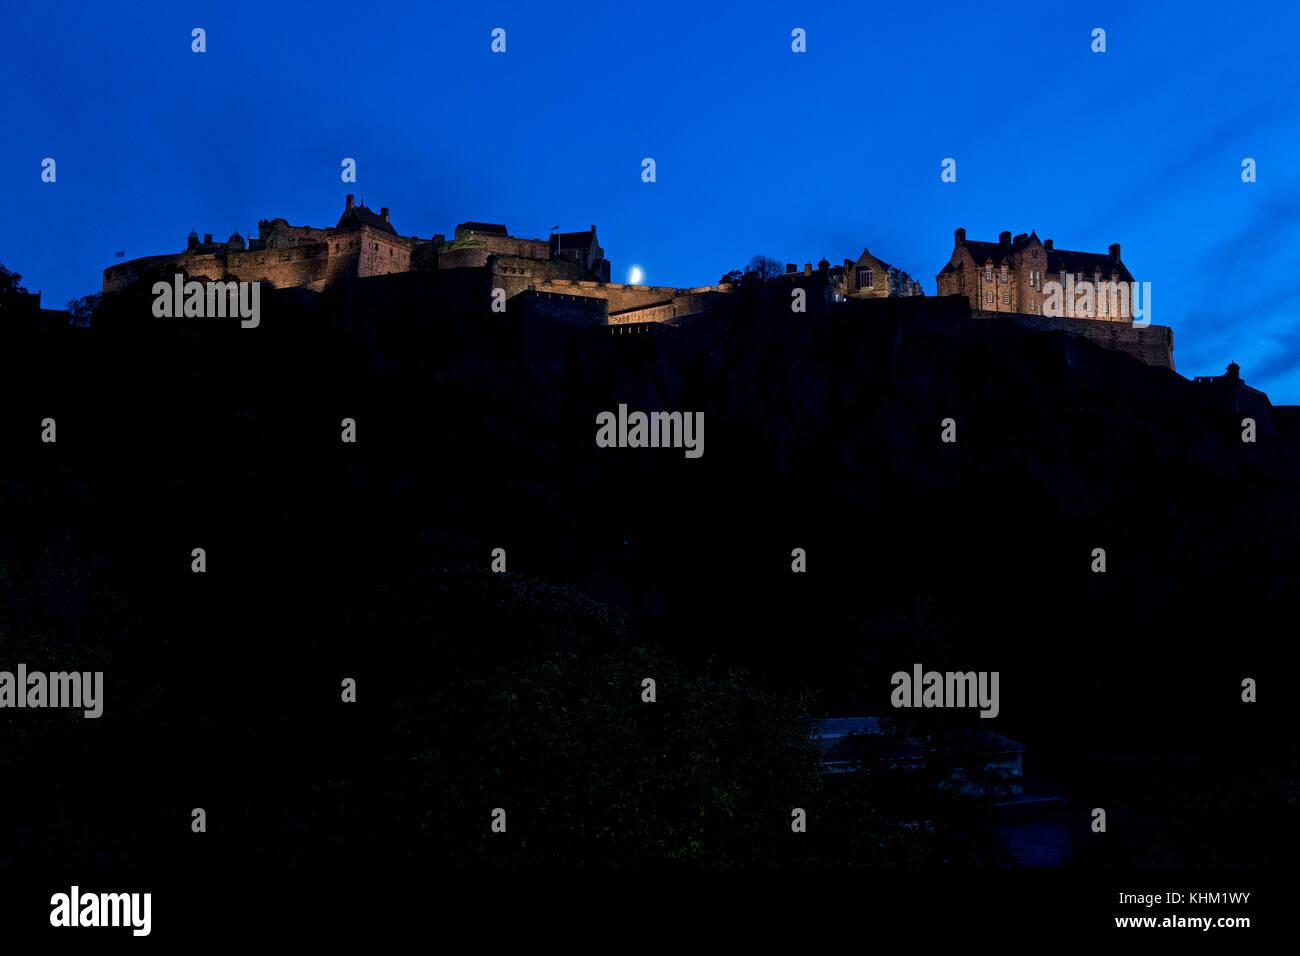 Schloss Edinburgh, Edinburgh, Schottland, Großbritannien Stockbild